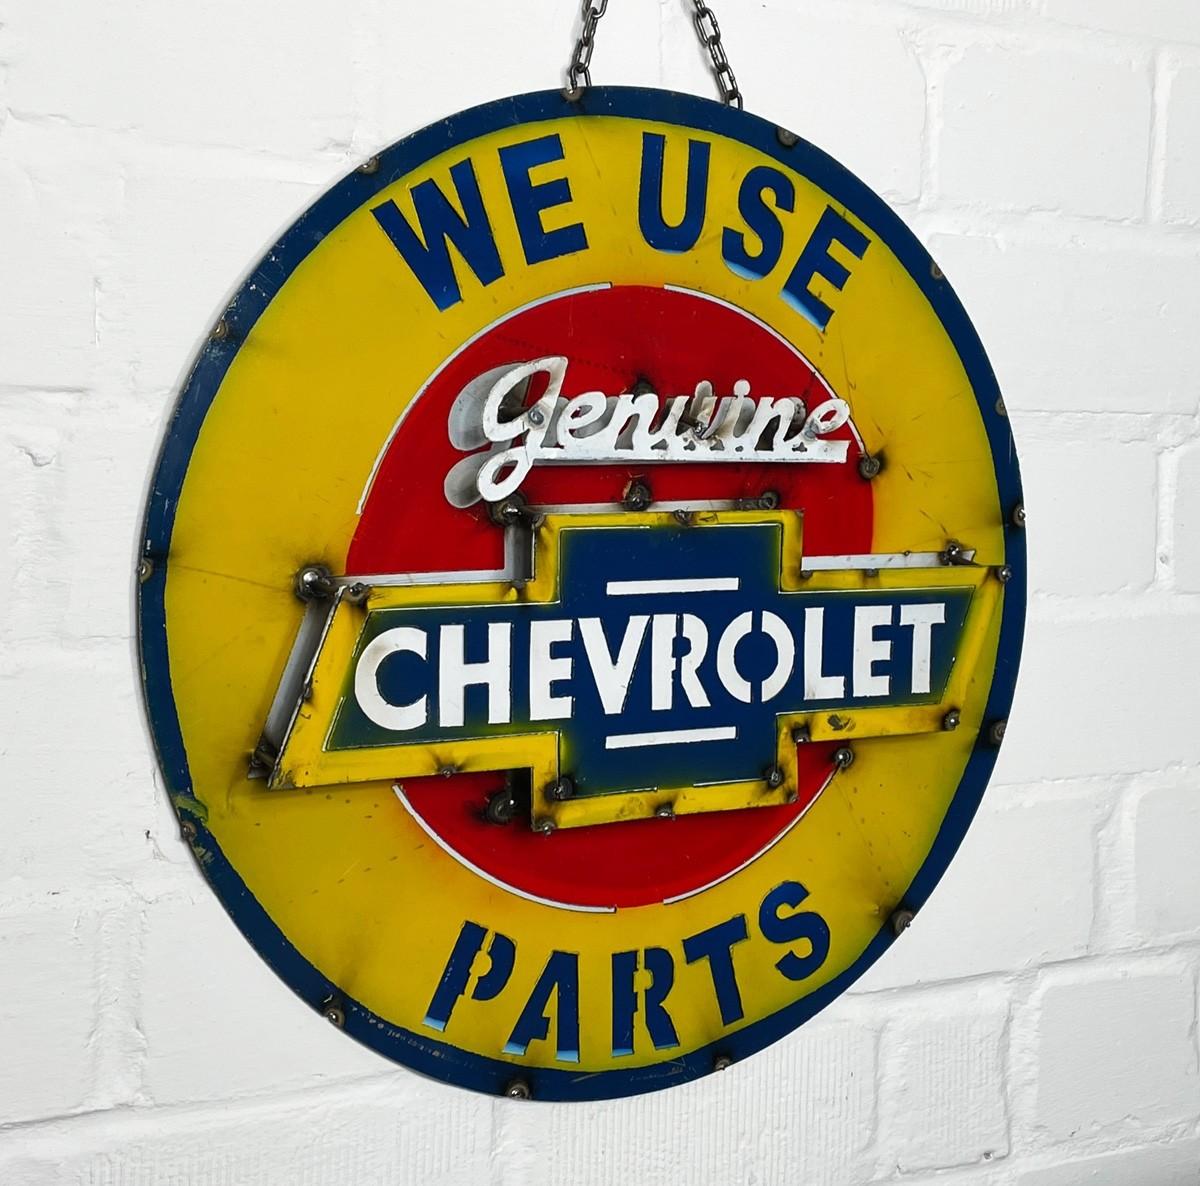 We Use Genuine Chevrolet Parts 3D Schild